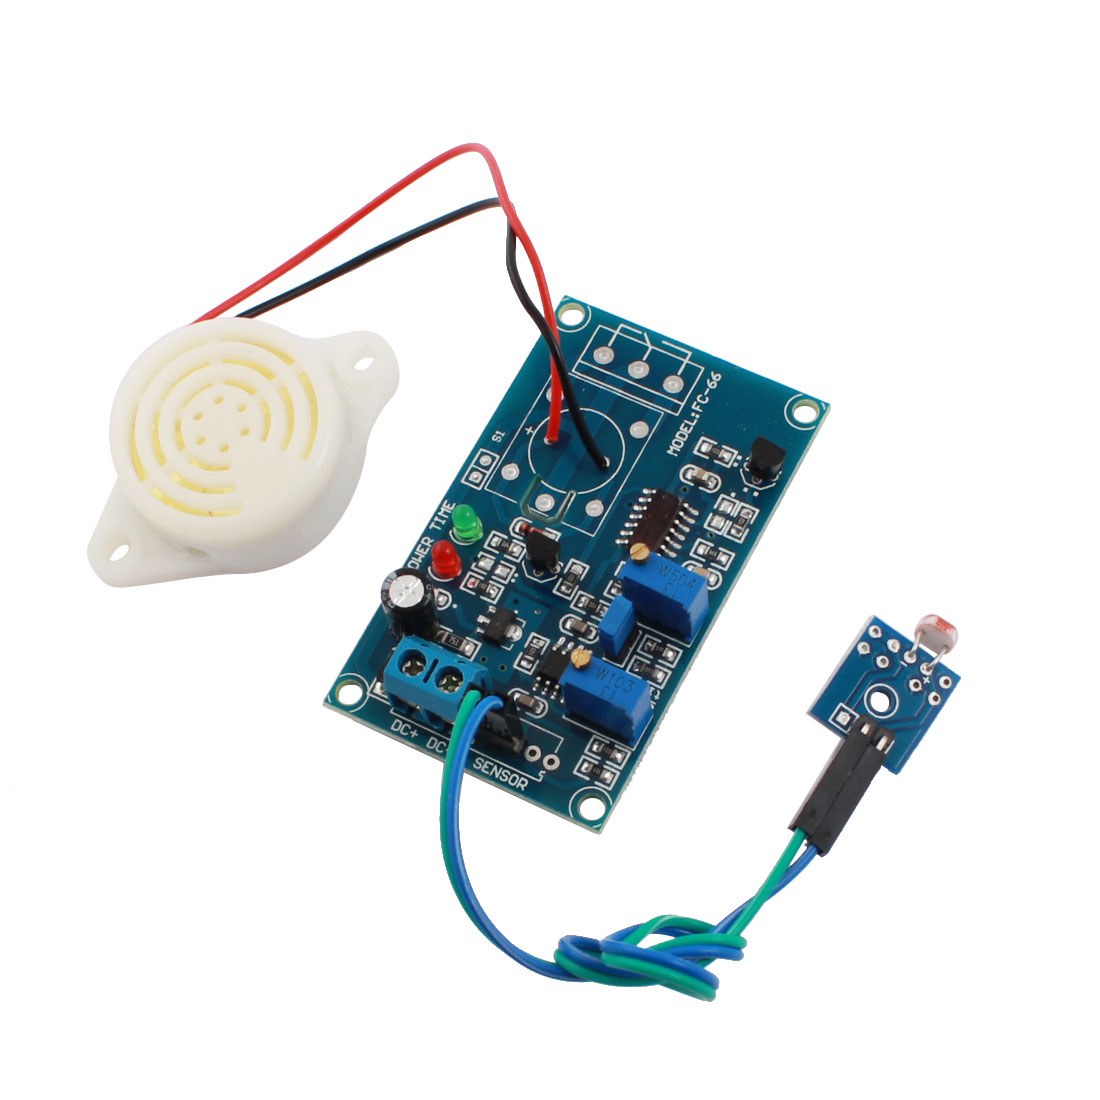 FC-66 DC24V No Light Trigger Photoresistor Detection Sensor Alarm Delay PCB Circuit Module w Piezo Buzzer